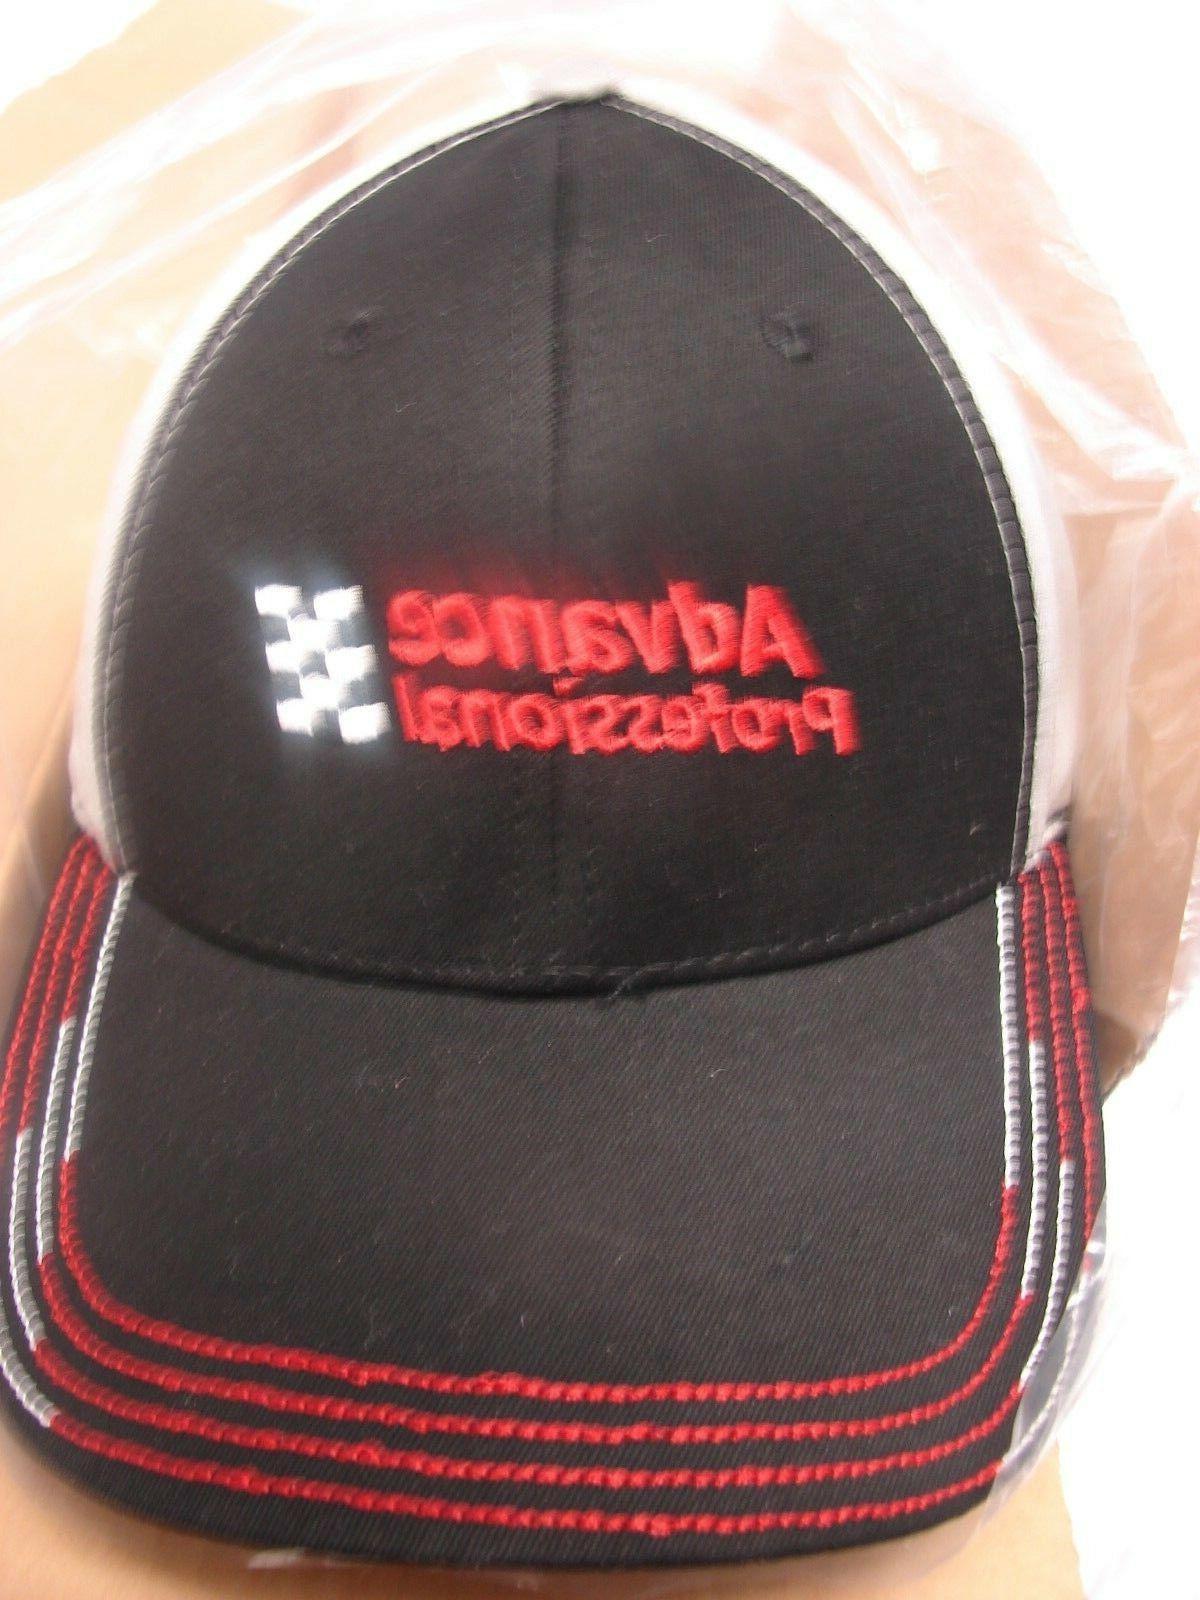 advance auto parts professional baseball hat cap